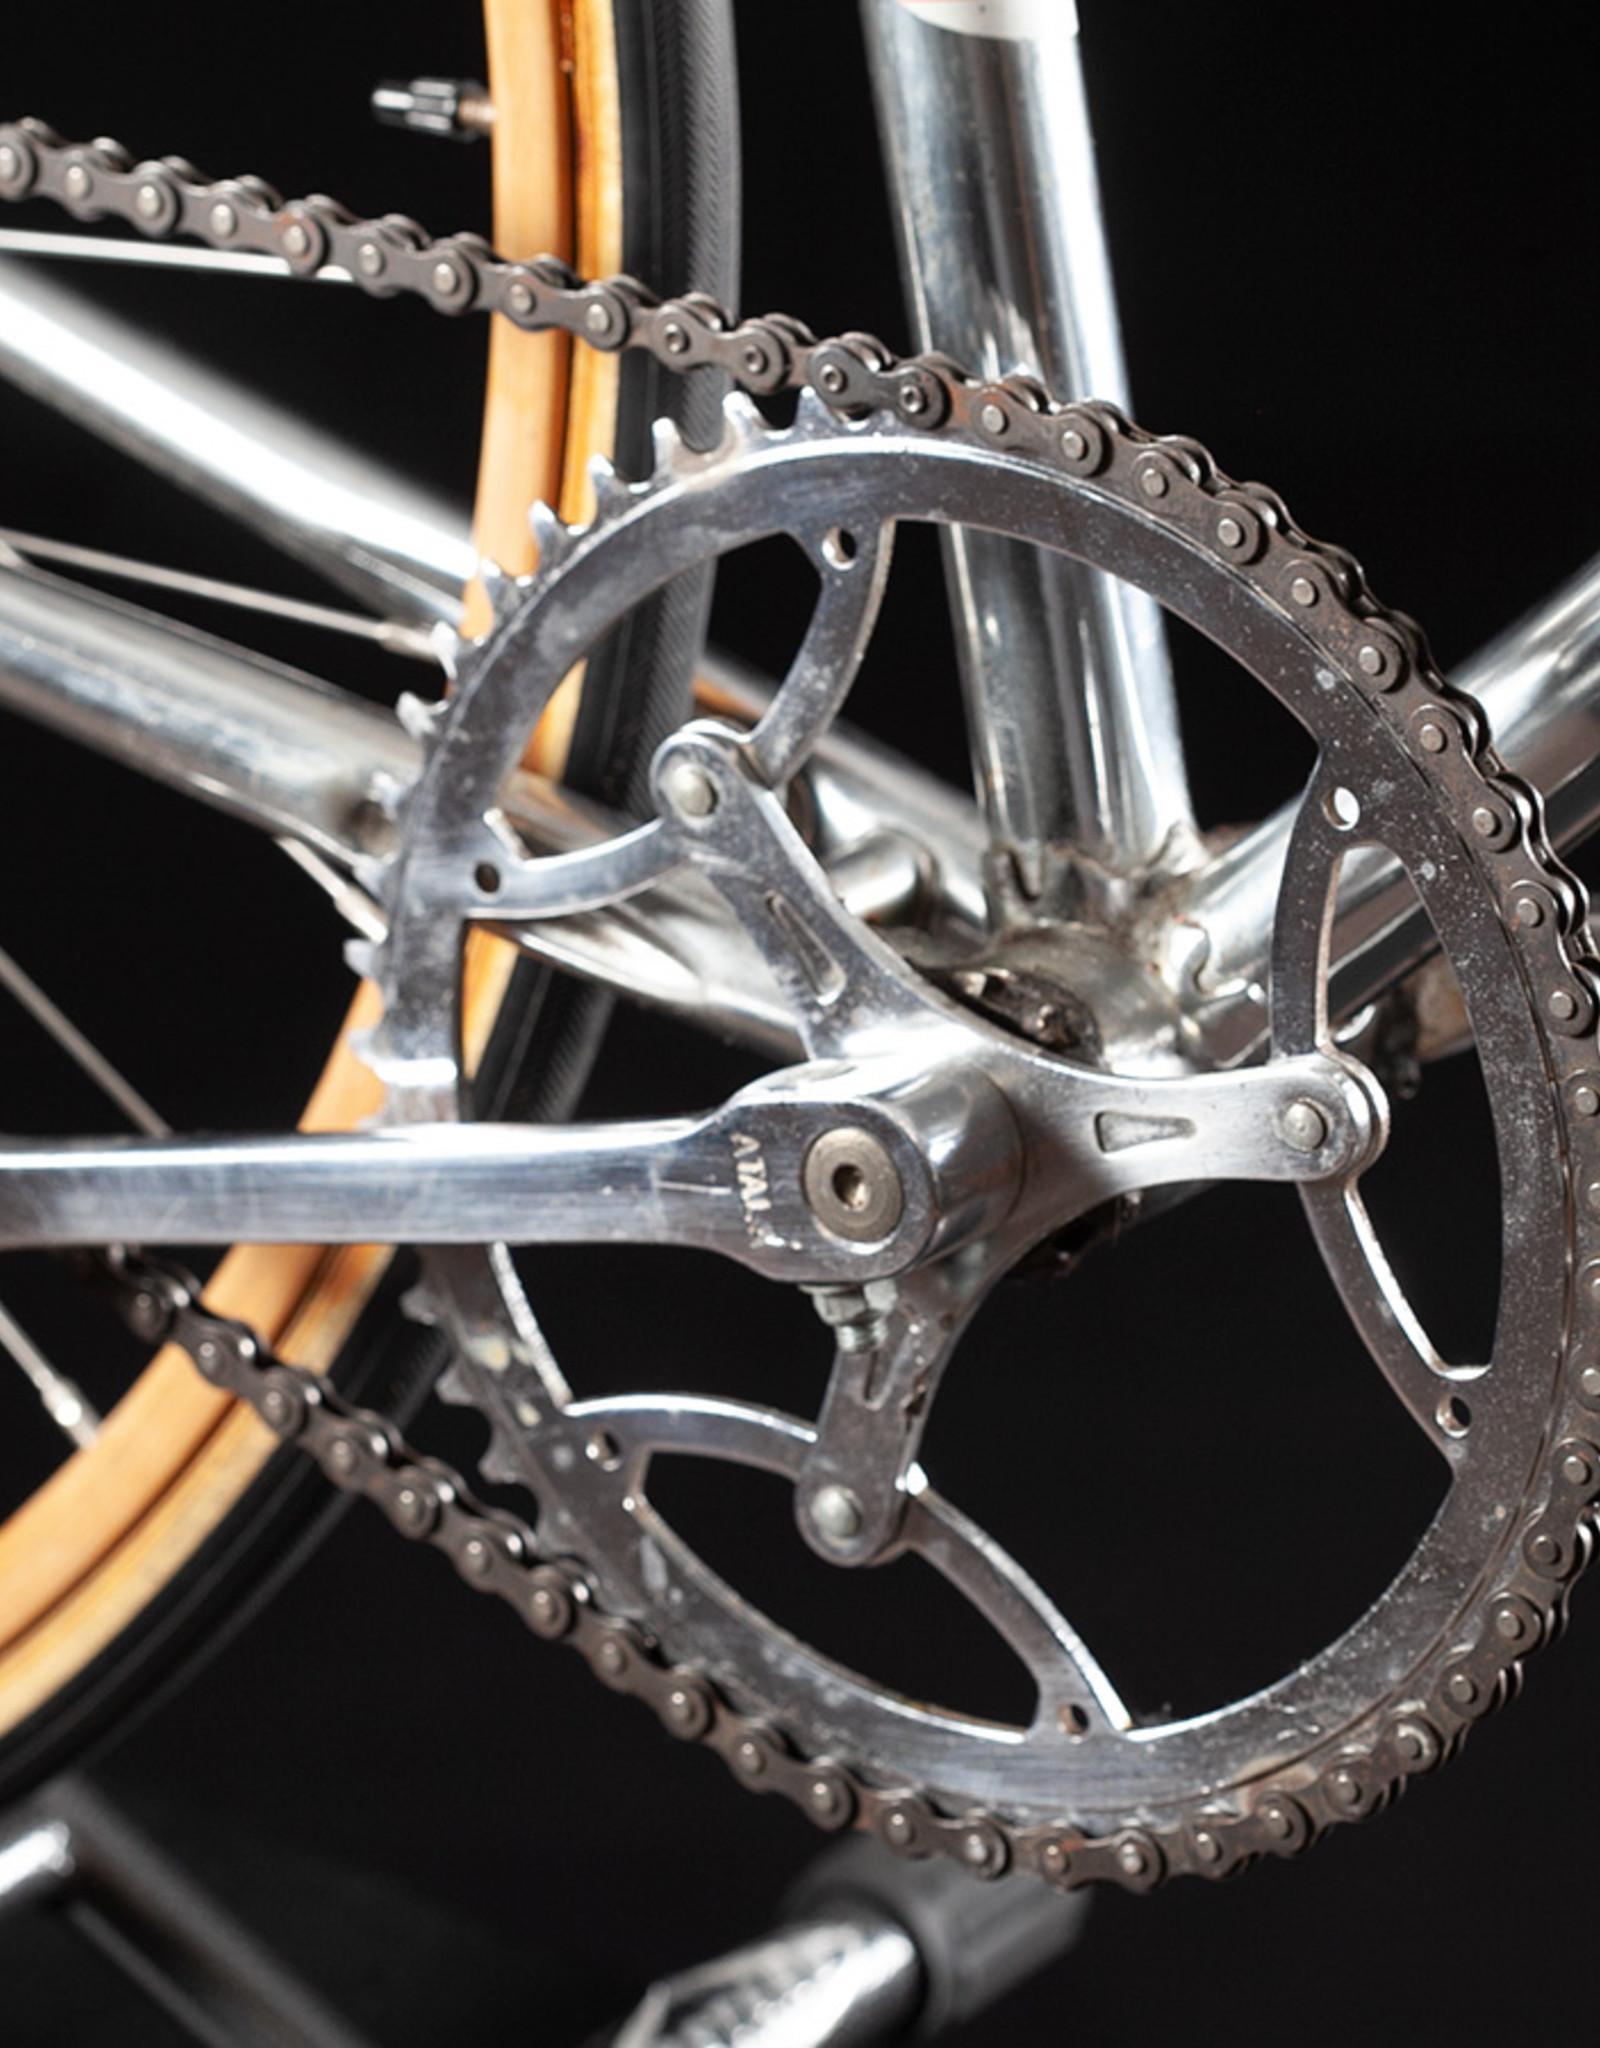 Rare Vintage 60's Atala track Bike with wooden rims rare Cinelli stem